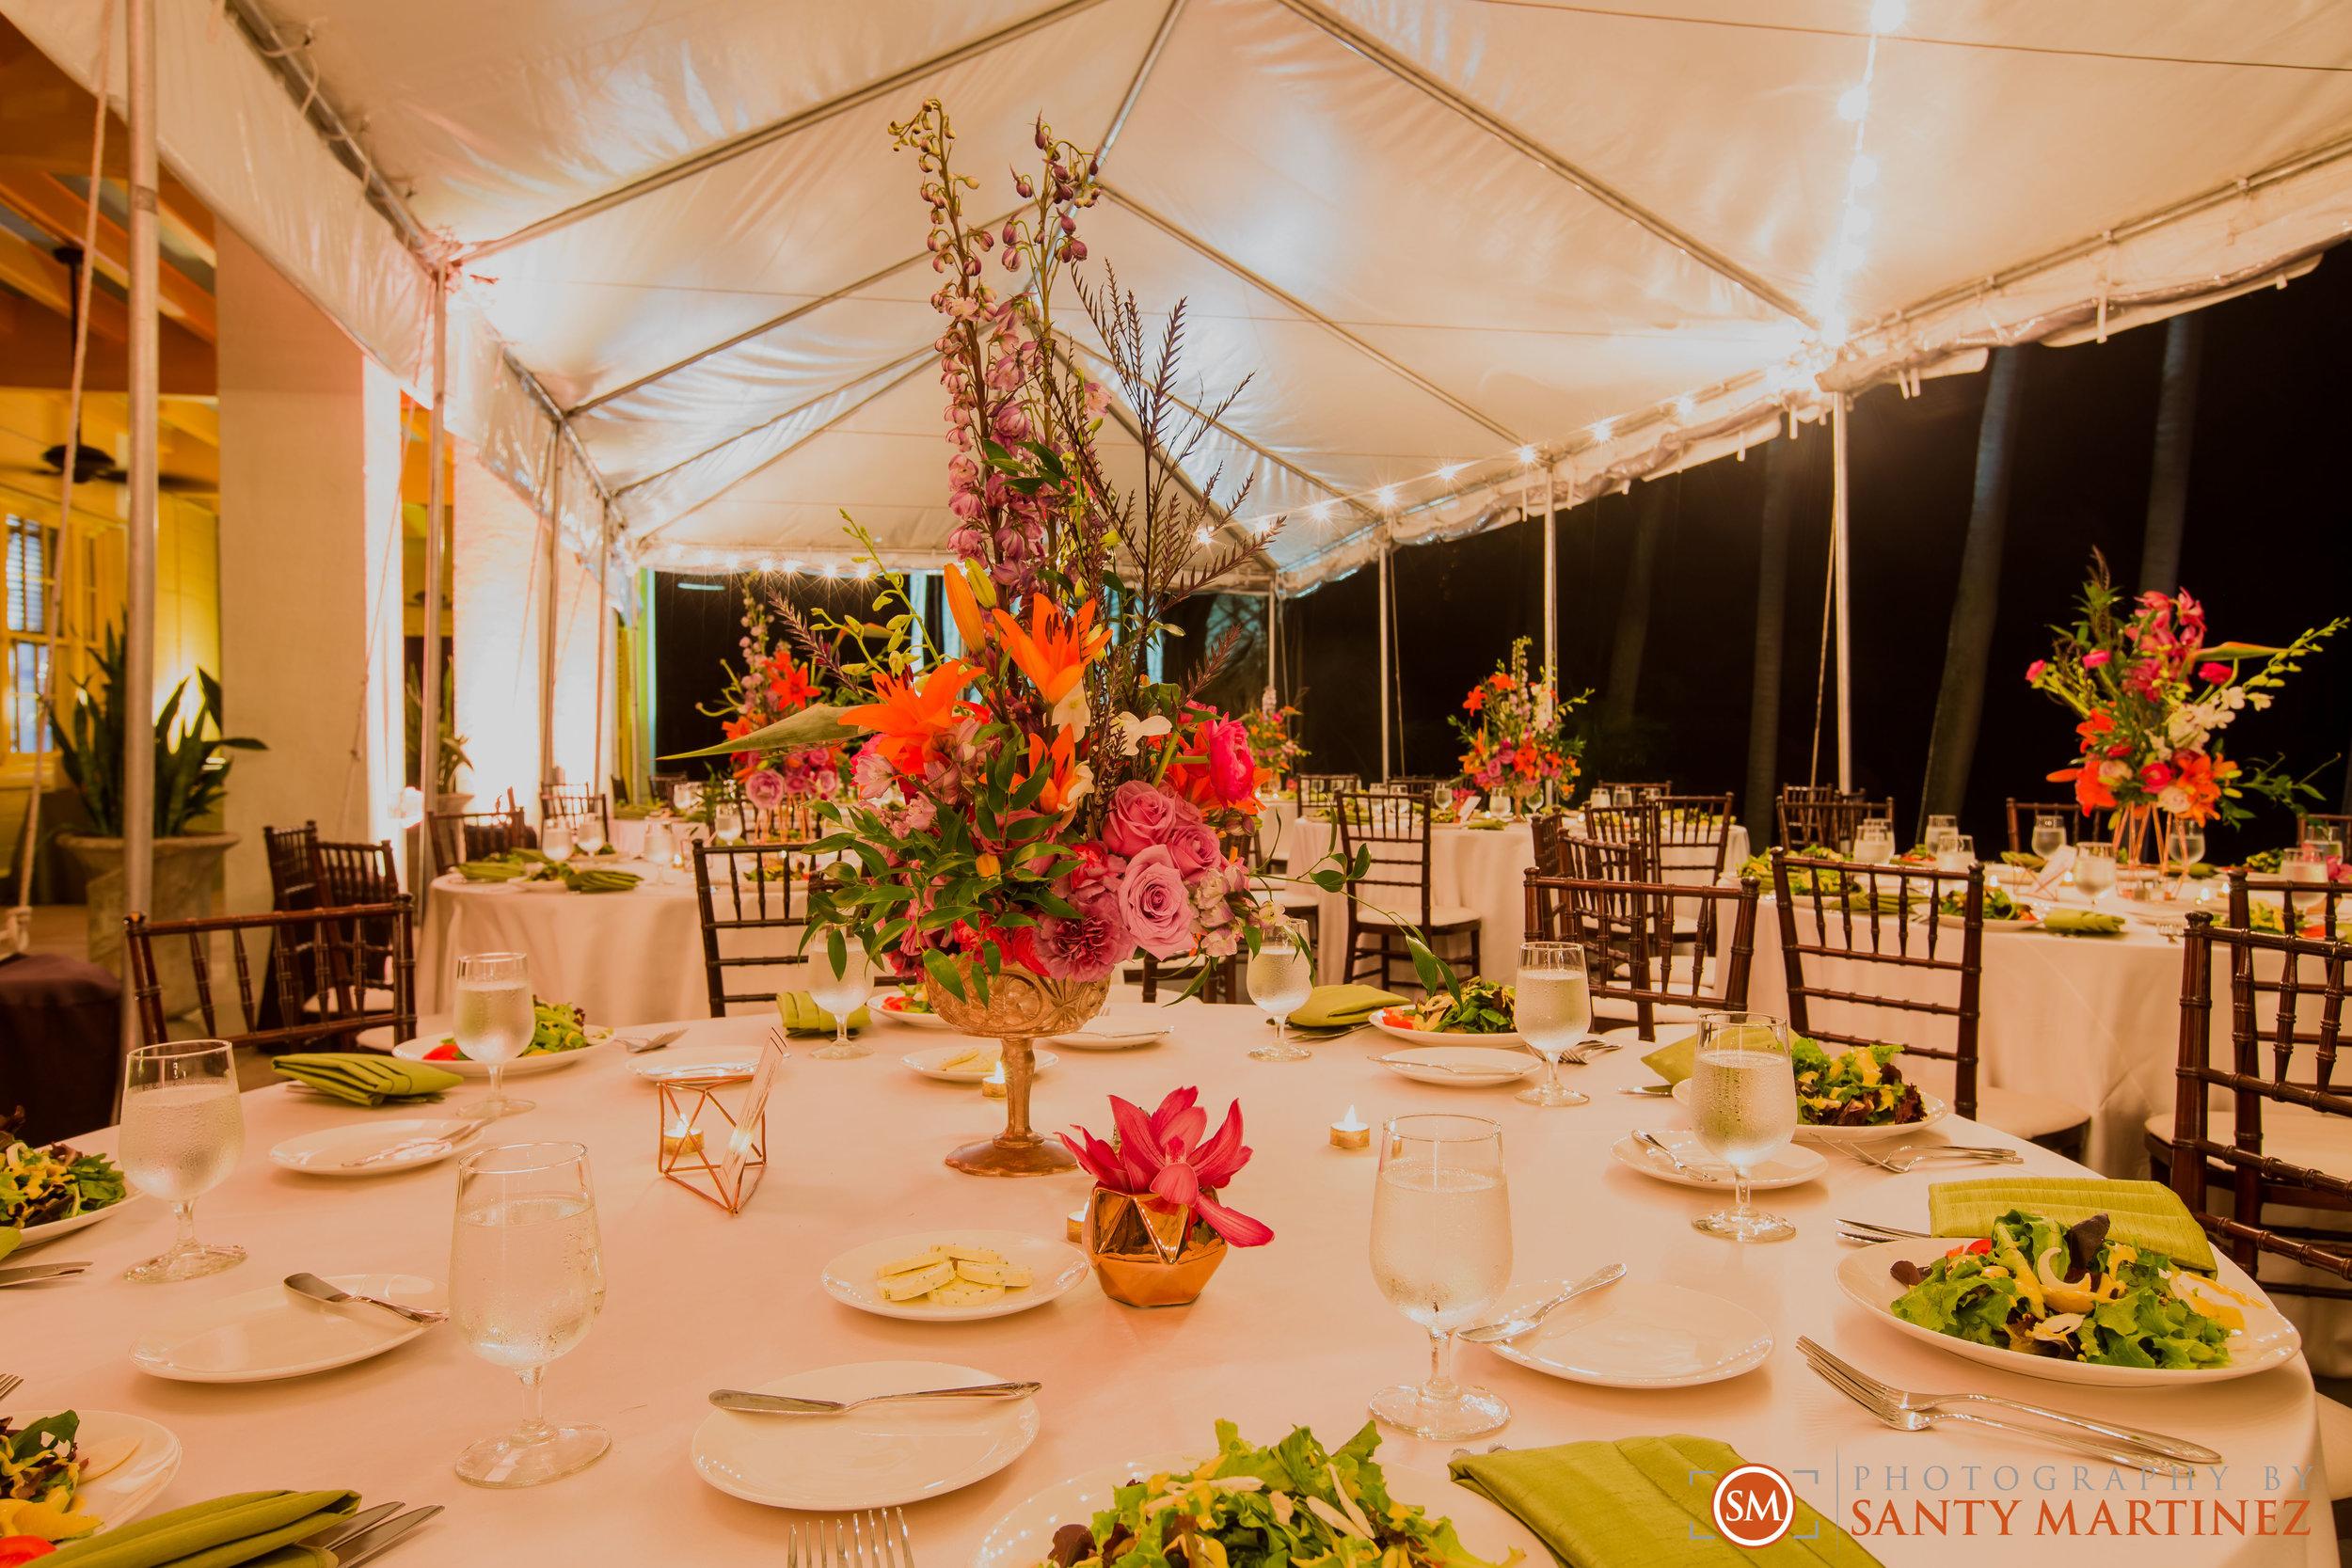 Wedding Bonnet House - Photography by Santy Martinez-38.jpg